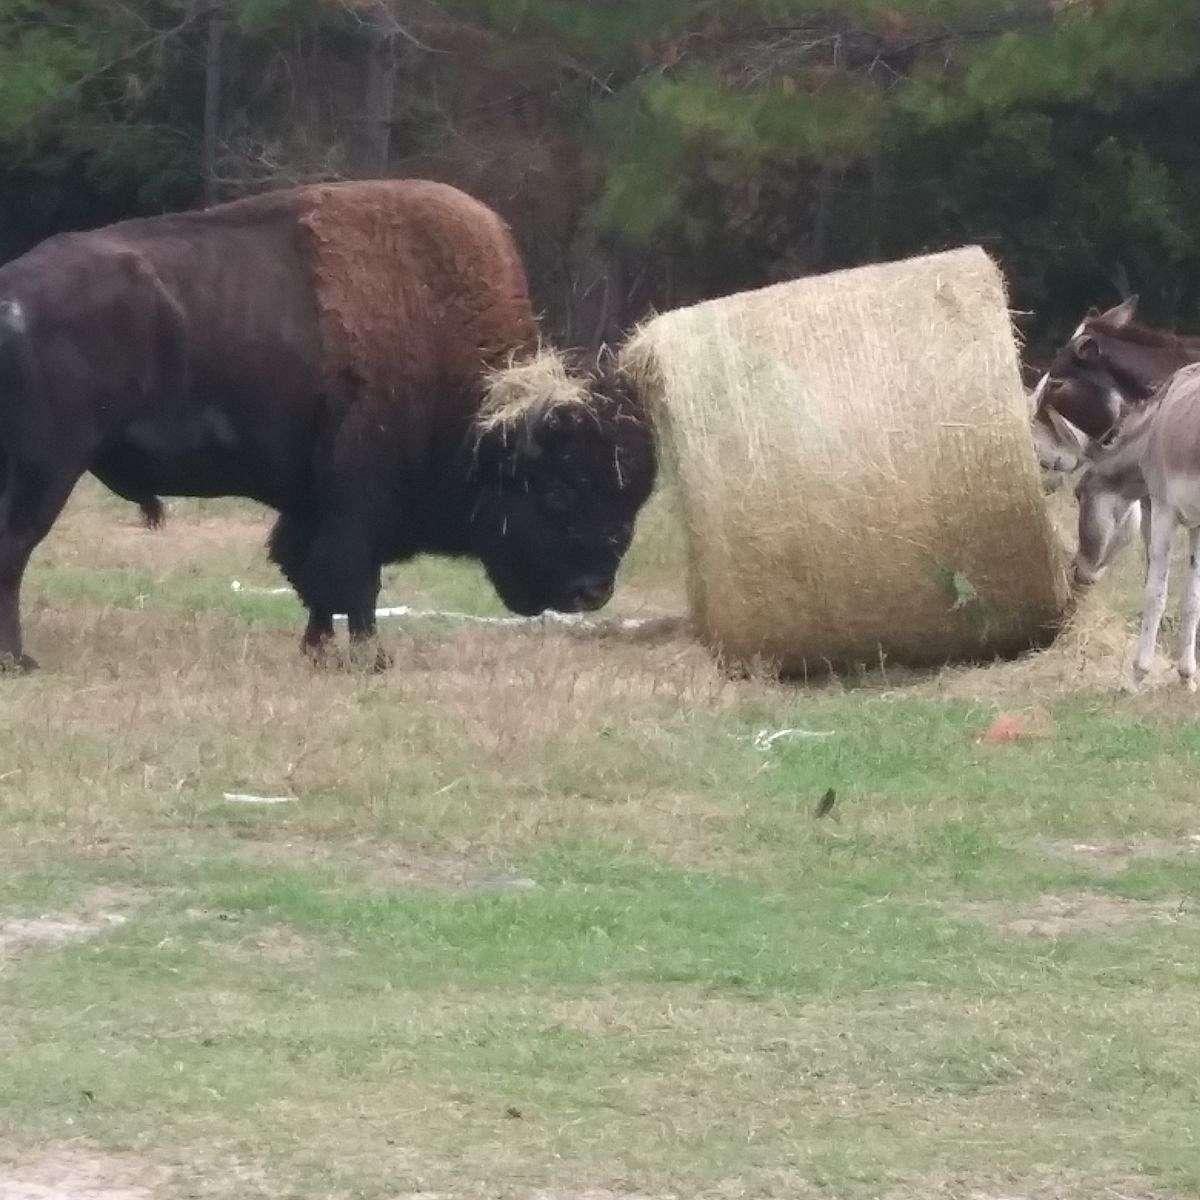 Big E's Livestock